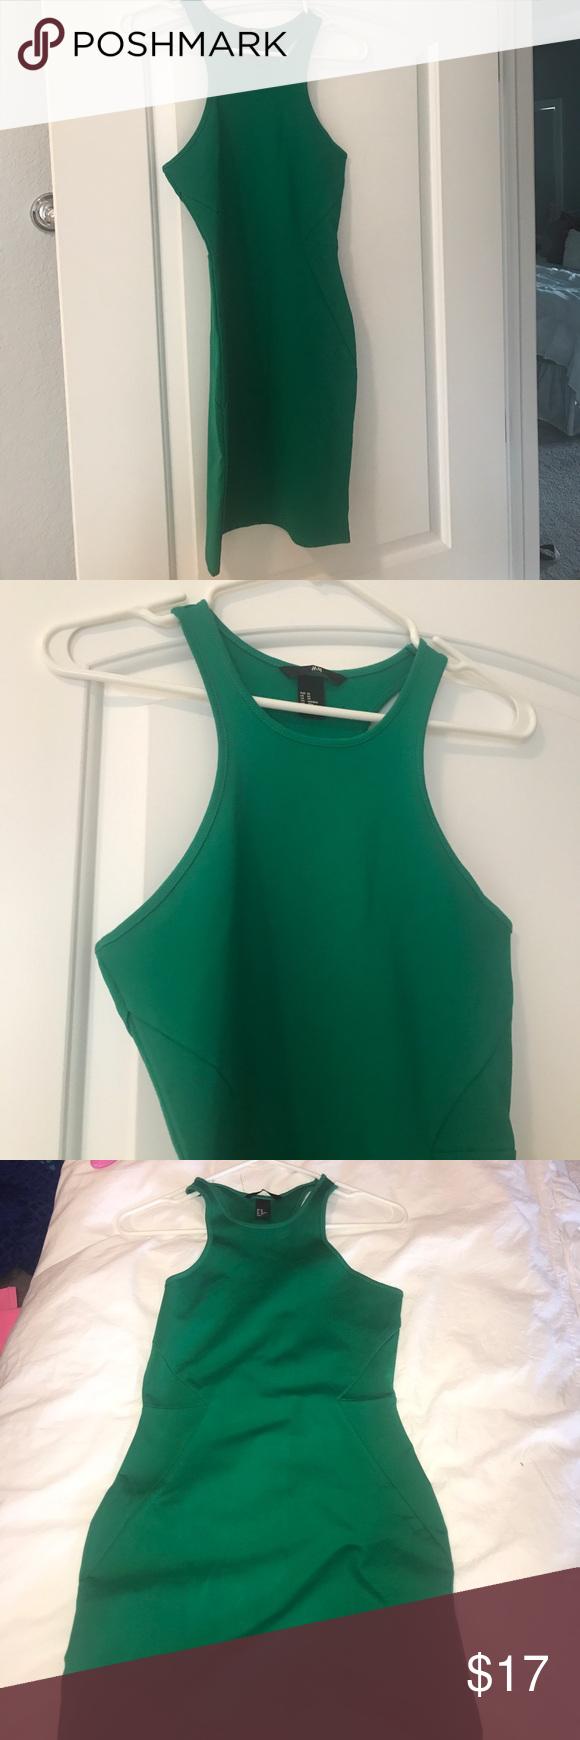 H&m dusty pink dress  HuM green bodycon dress  Green bodies Body con and Bodycon dress